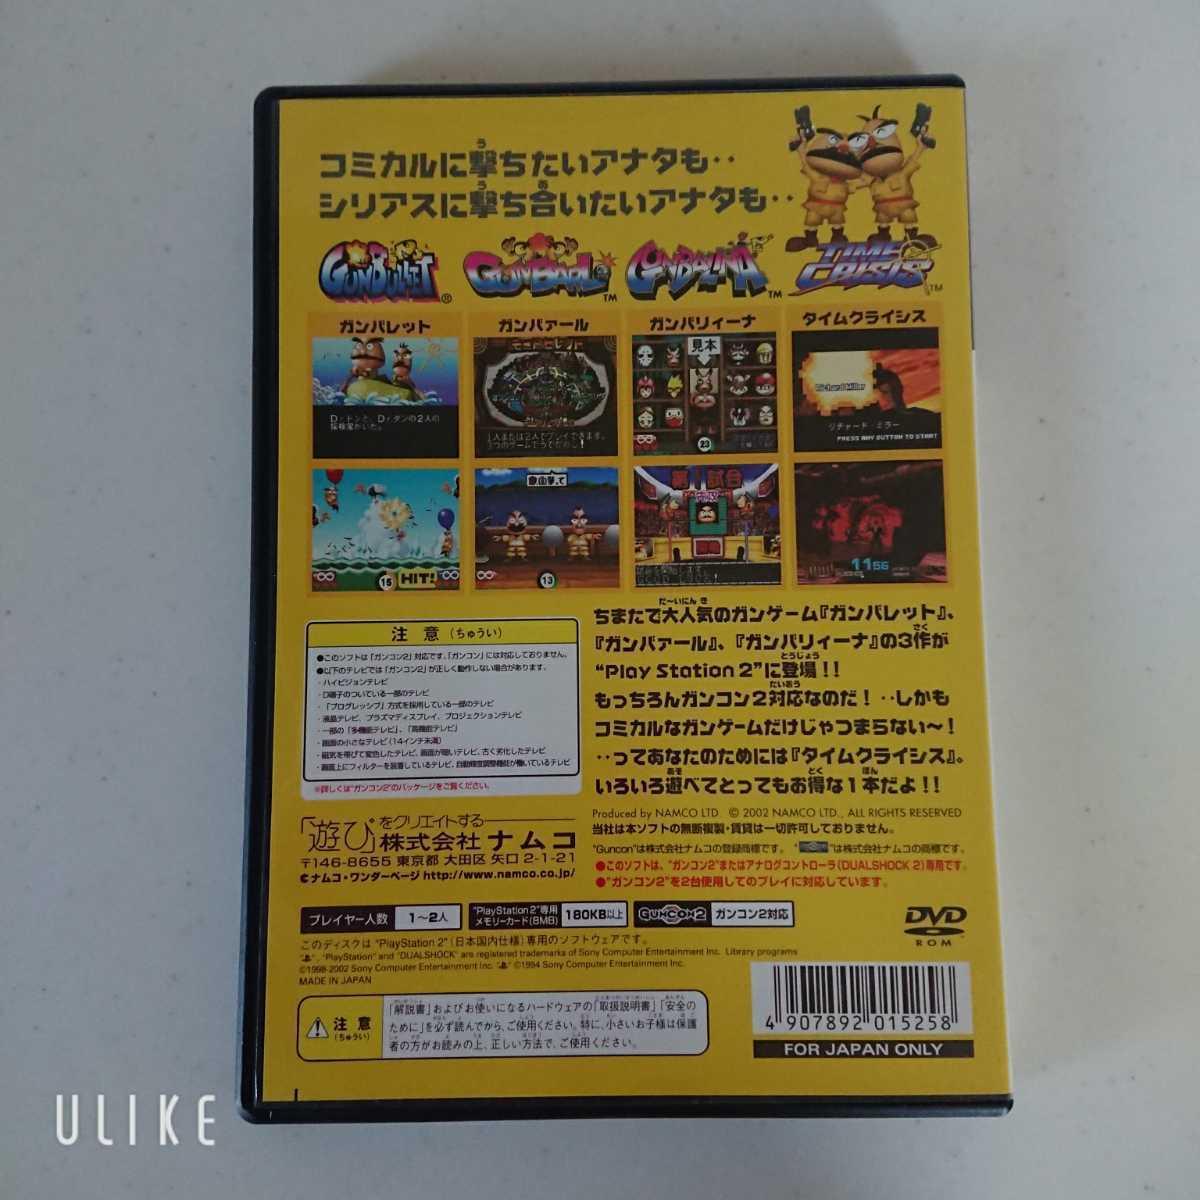 PS2 ソフト ガンバリコレクション+タイムクライシス 動作確認済 送料無料!